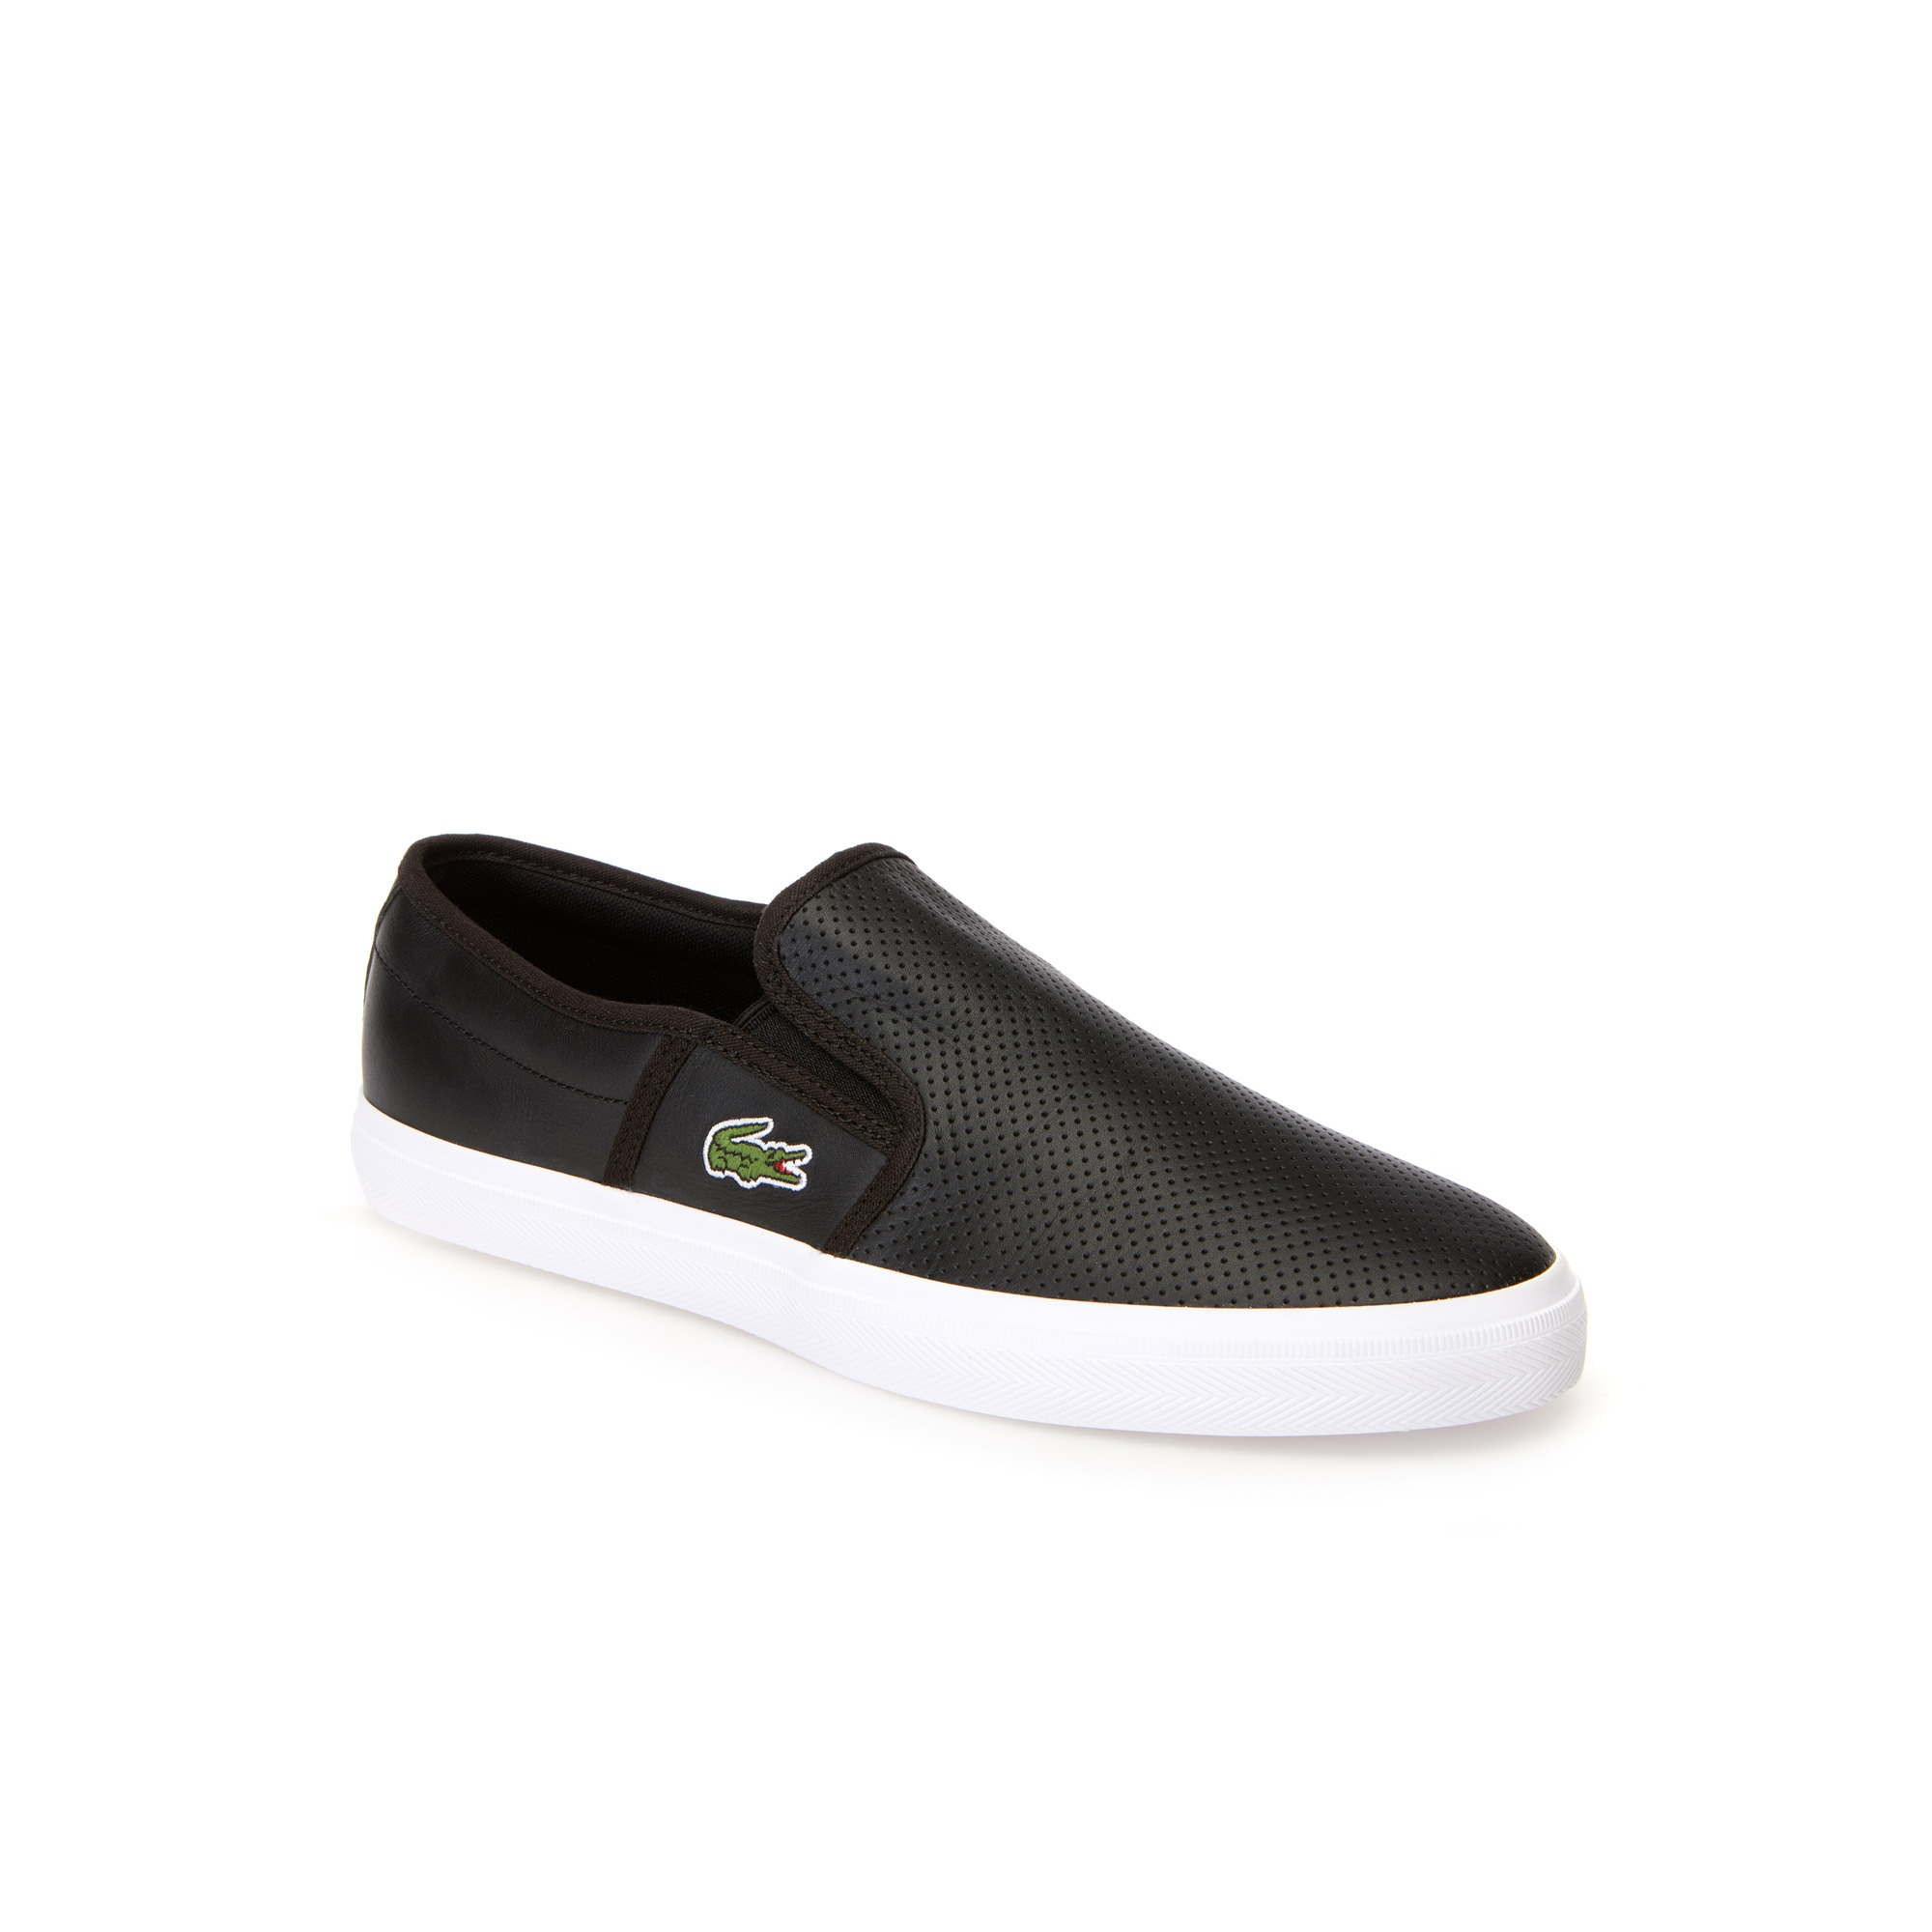 Men's Gazon Leather Slip-ons | LACOSTE